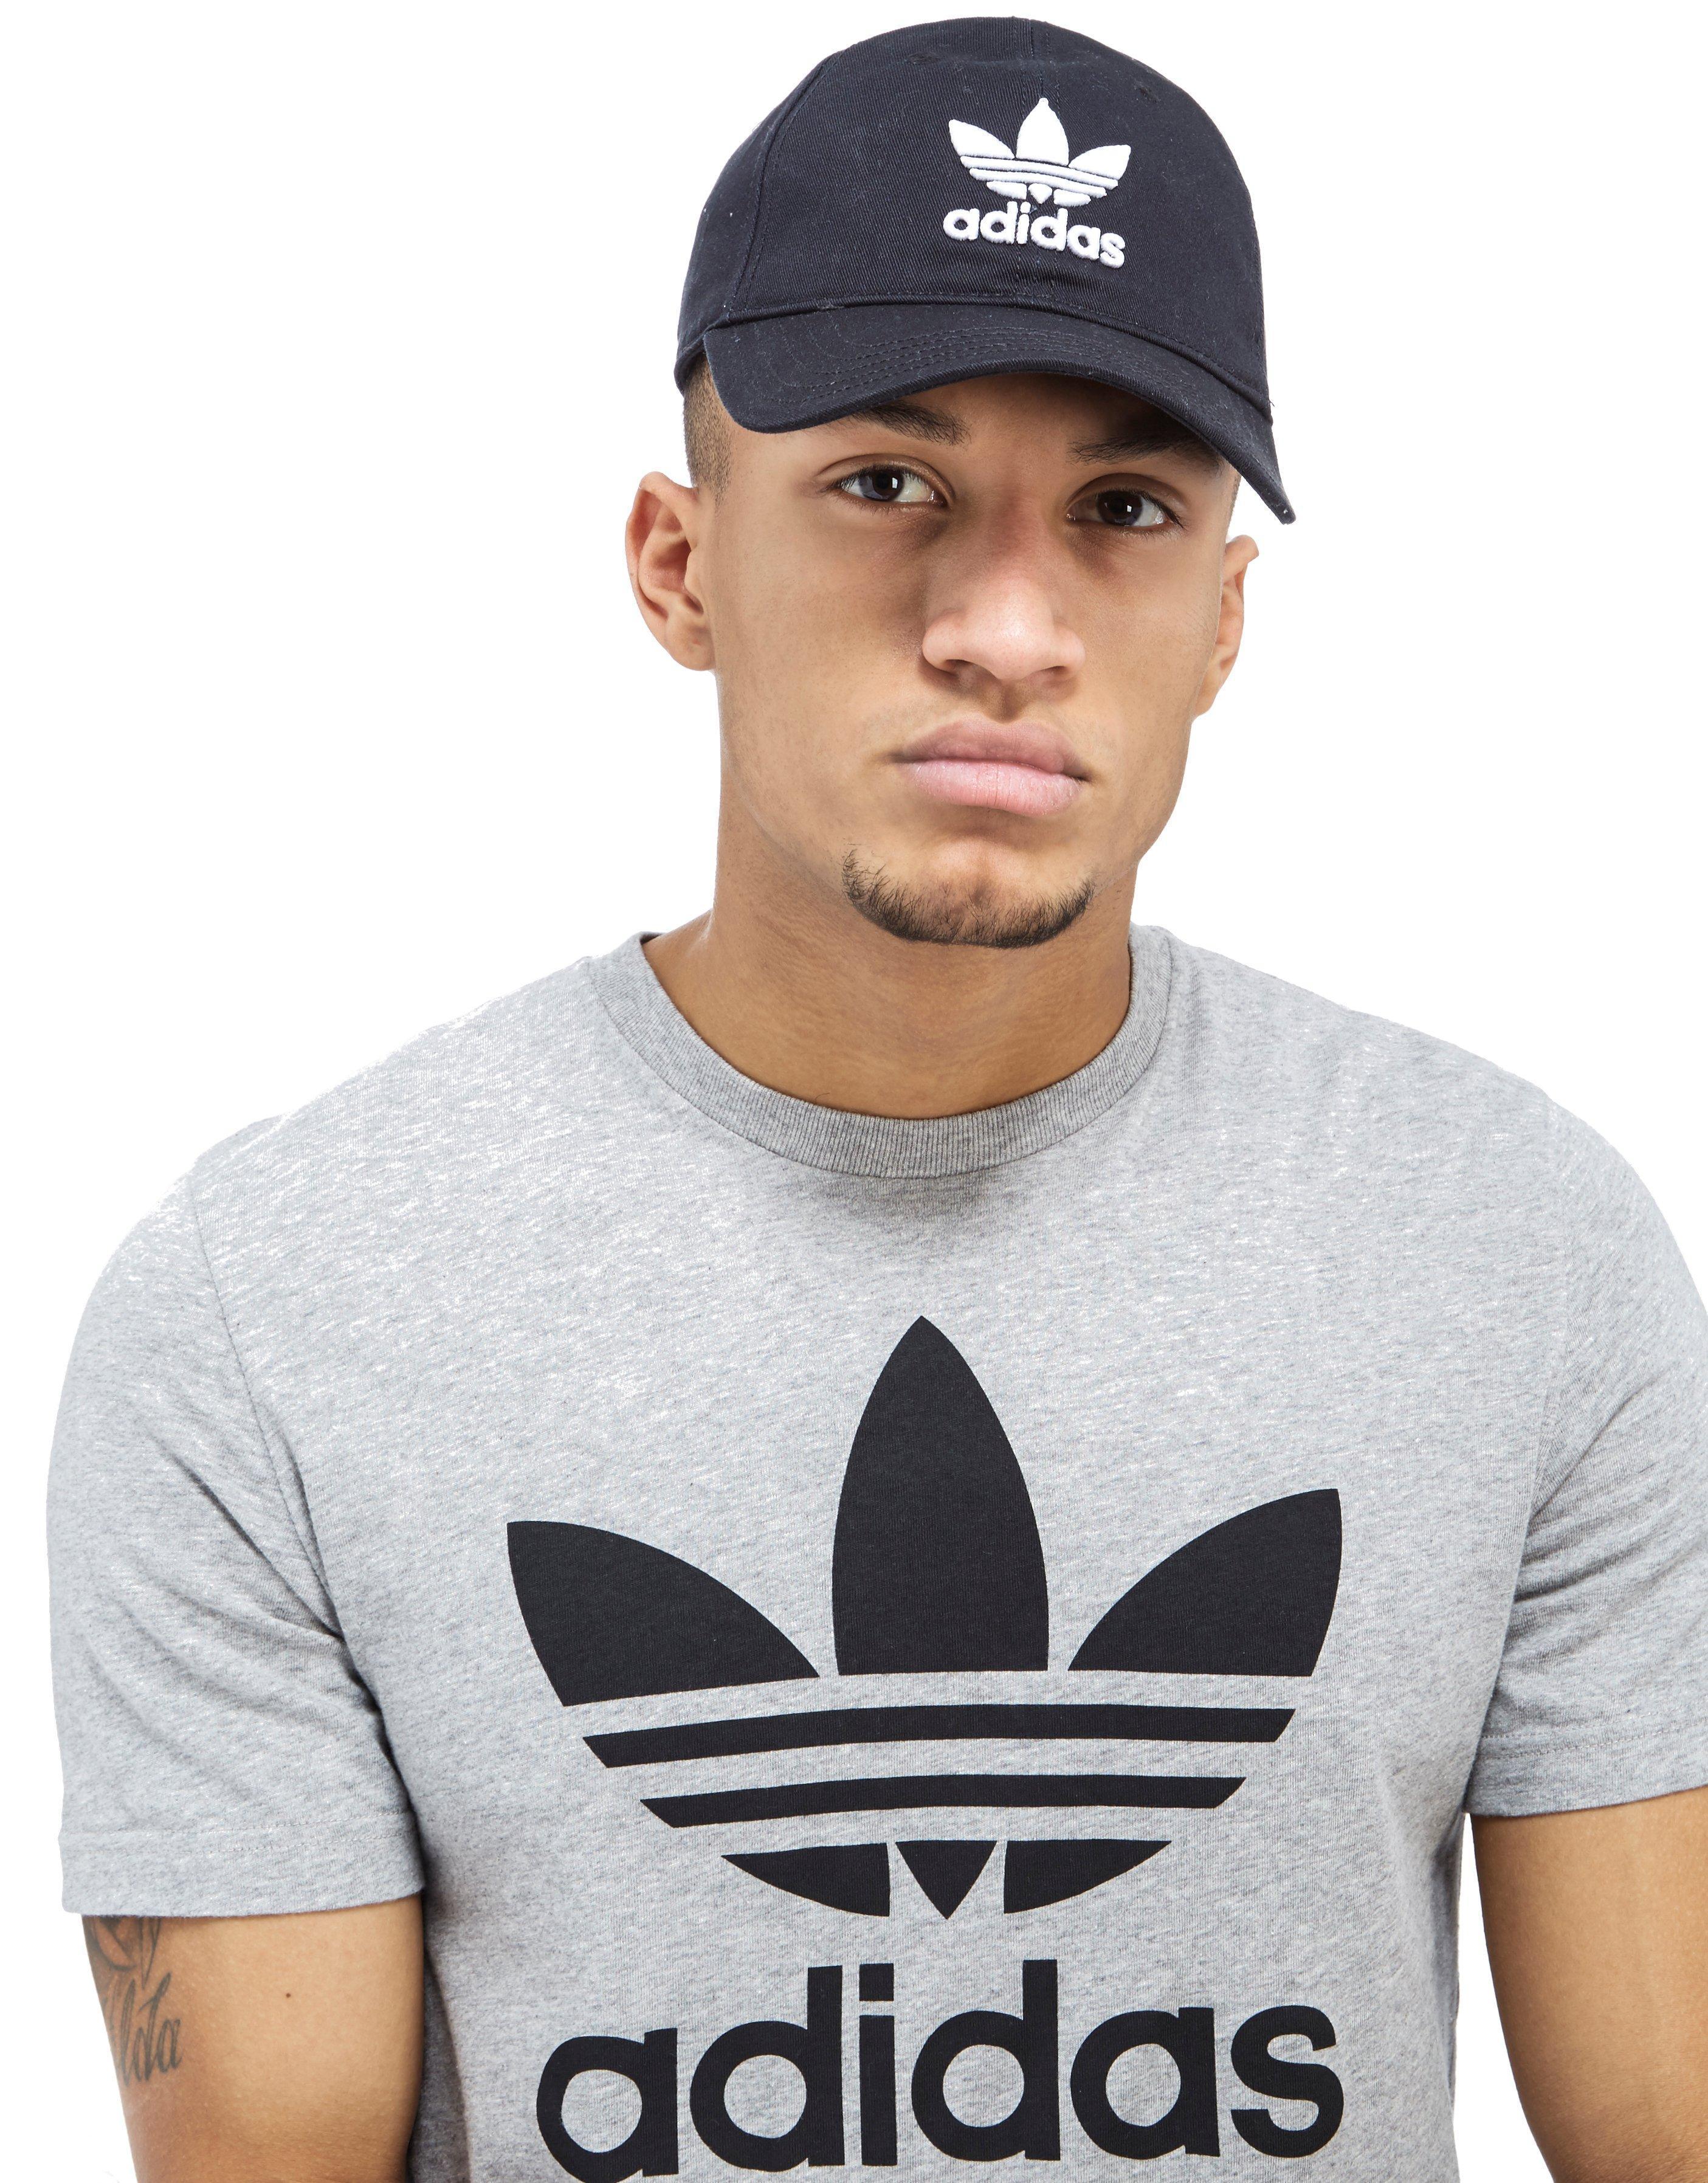 Adidas Originals - Black Trefoil Classic Cap for Men - Lyst. View Fullscreen